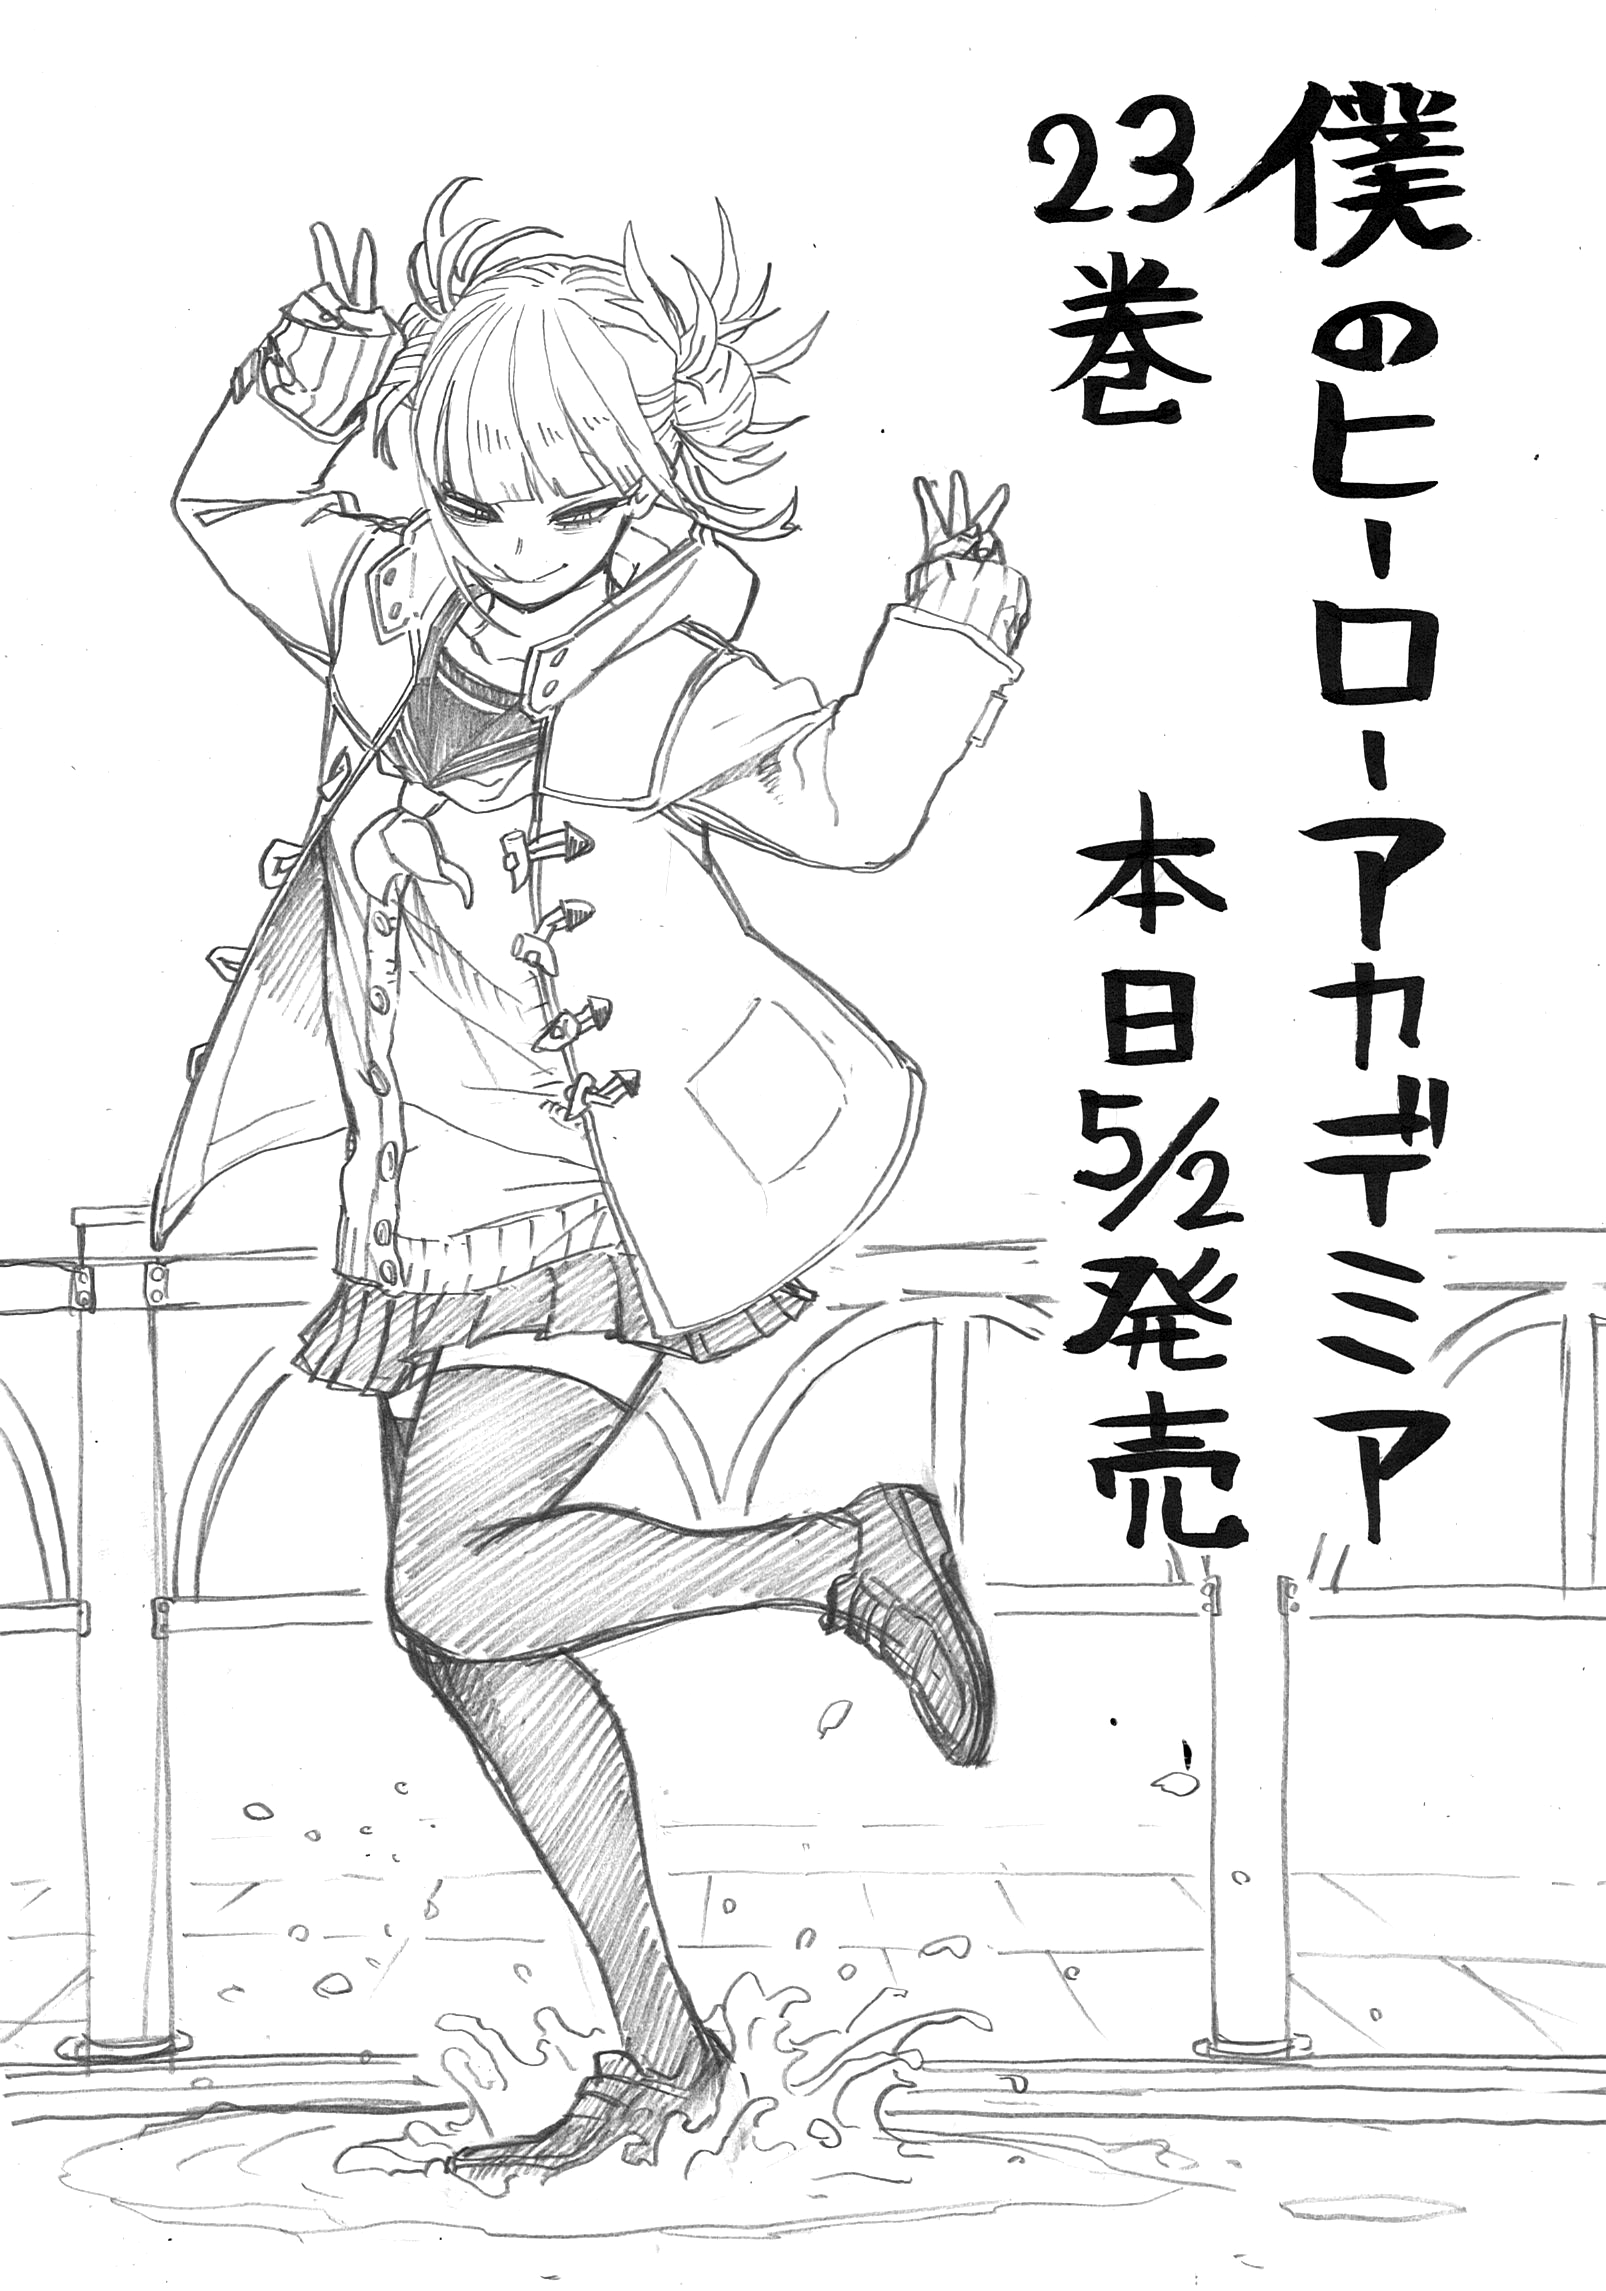 Volume 23 Sketch